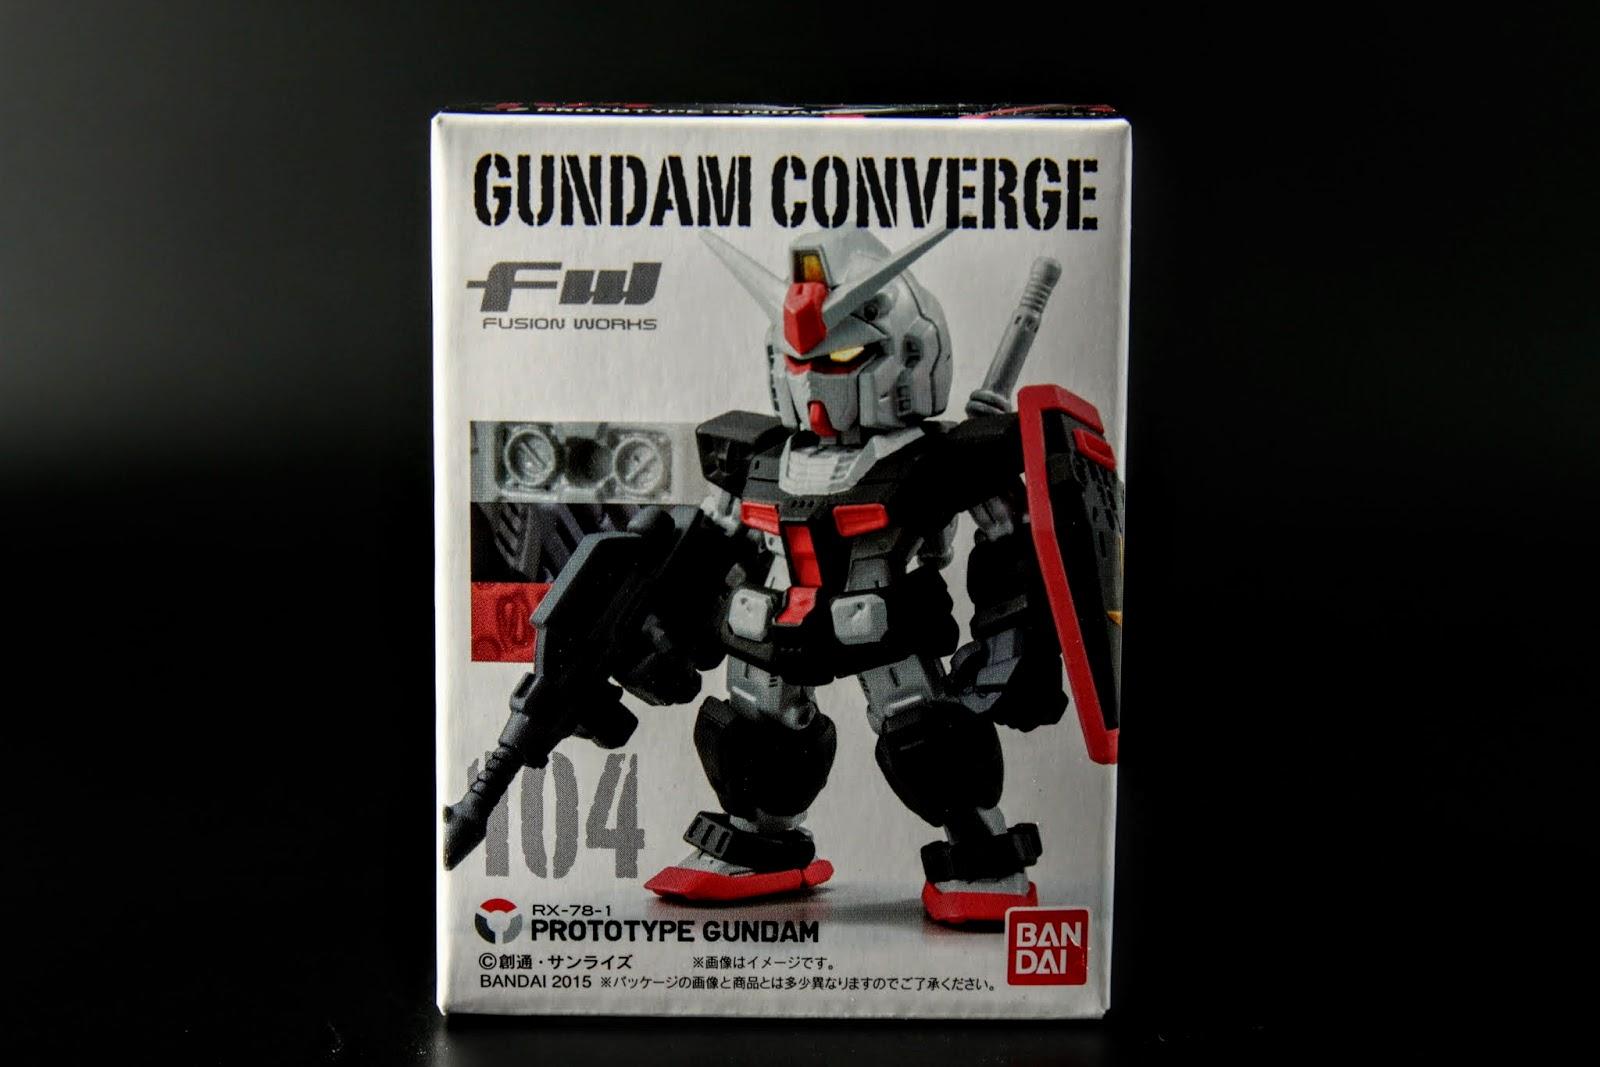 RX-78-1 Prototype Gundam;是的,又是共模,不過有細節不同